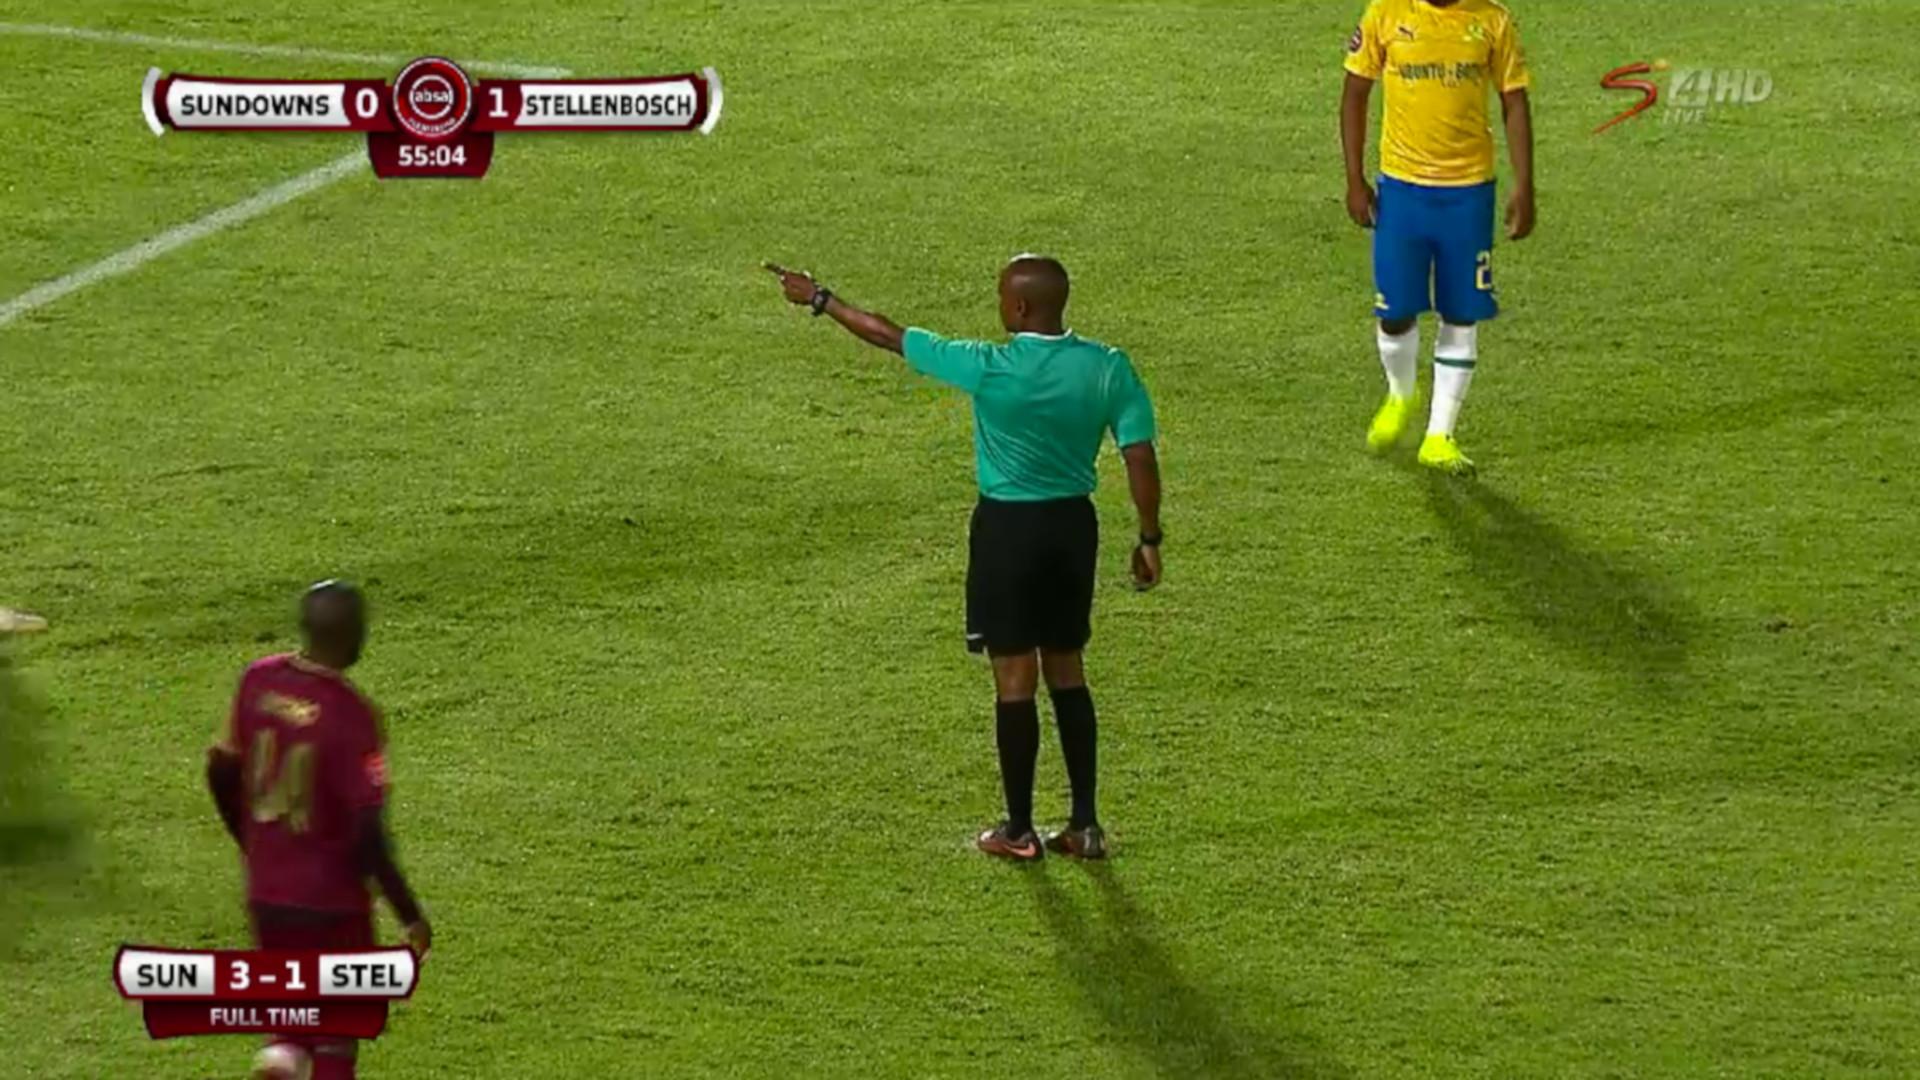 Absa Premiership | Mamelodi Sundowns v Stellenbosch FC | Controversial penalty